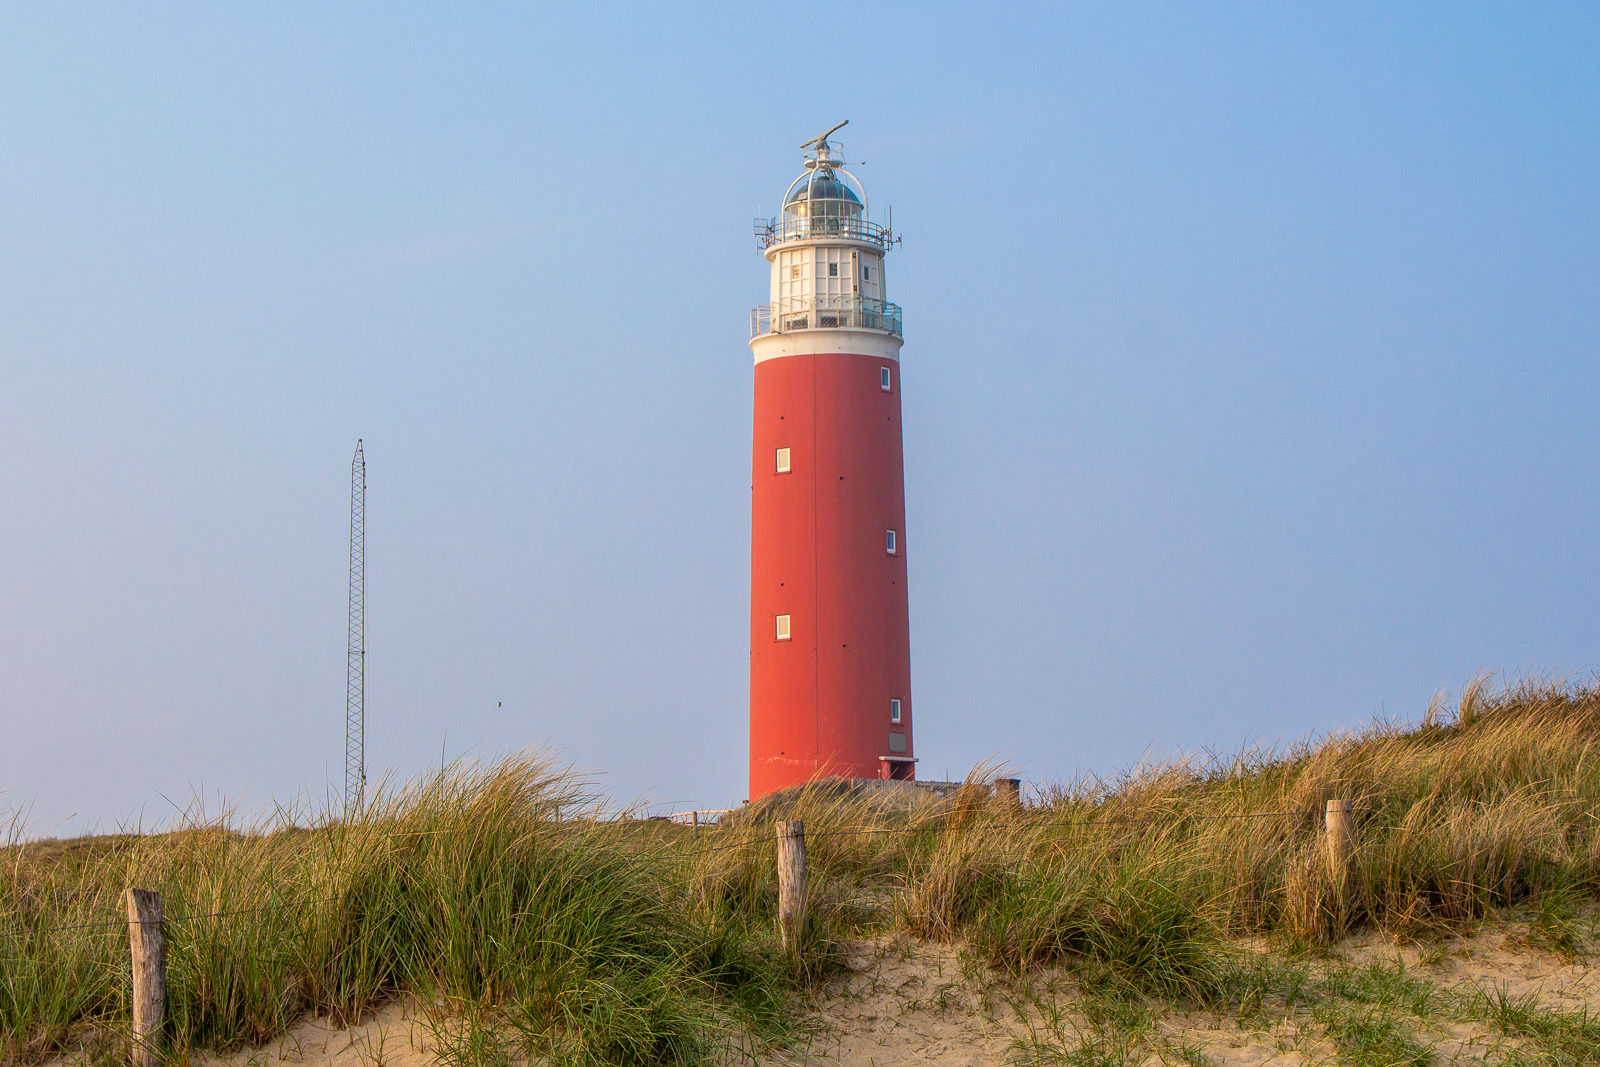 Leuchtturm, Texel, Strandgut, Museum, Texel, Strandgutmuseum Texel, Juttersmuseum Flora